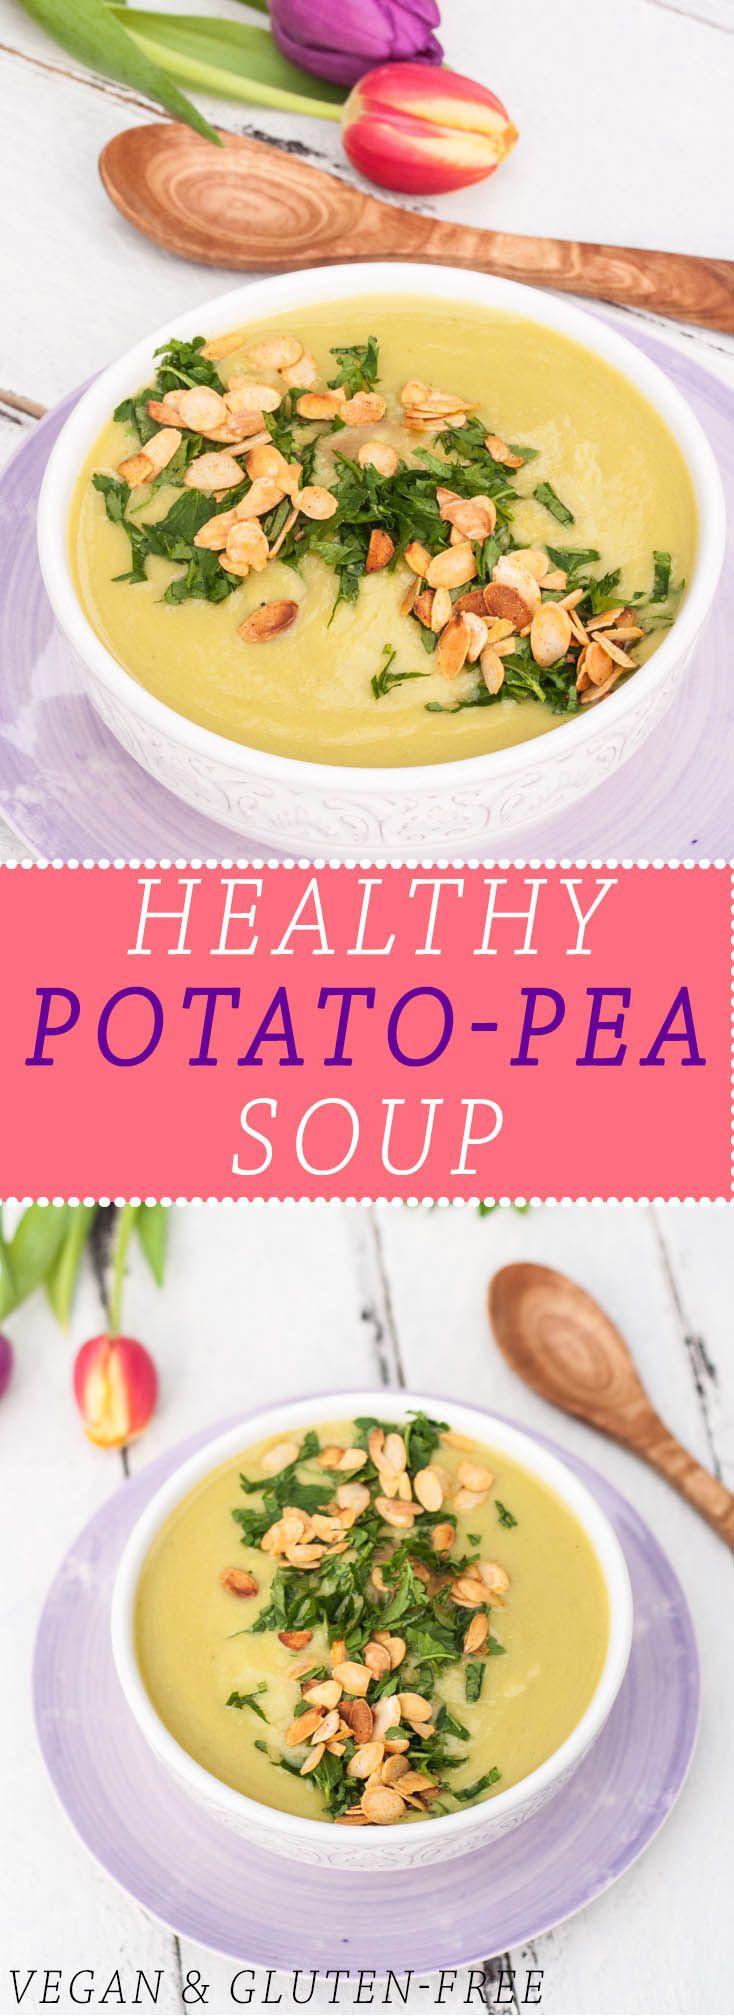 Healthy Potato Soup Recipe Easy  Check out Healthy Potato Pea Soup It s so easy to make